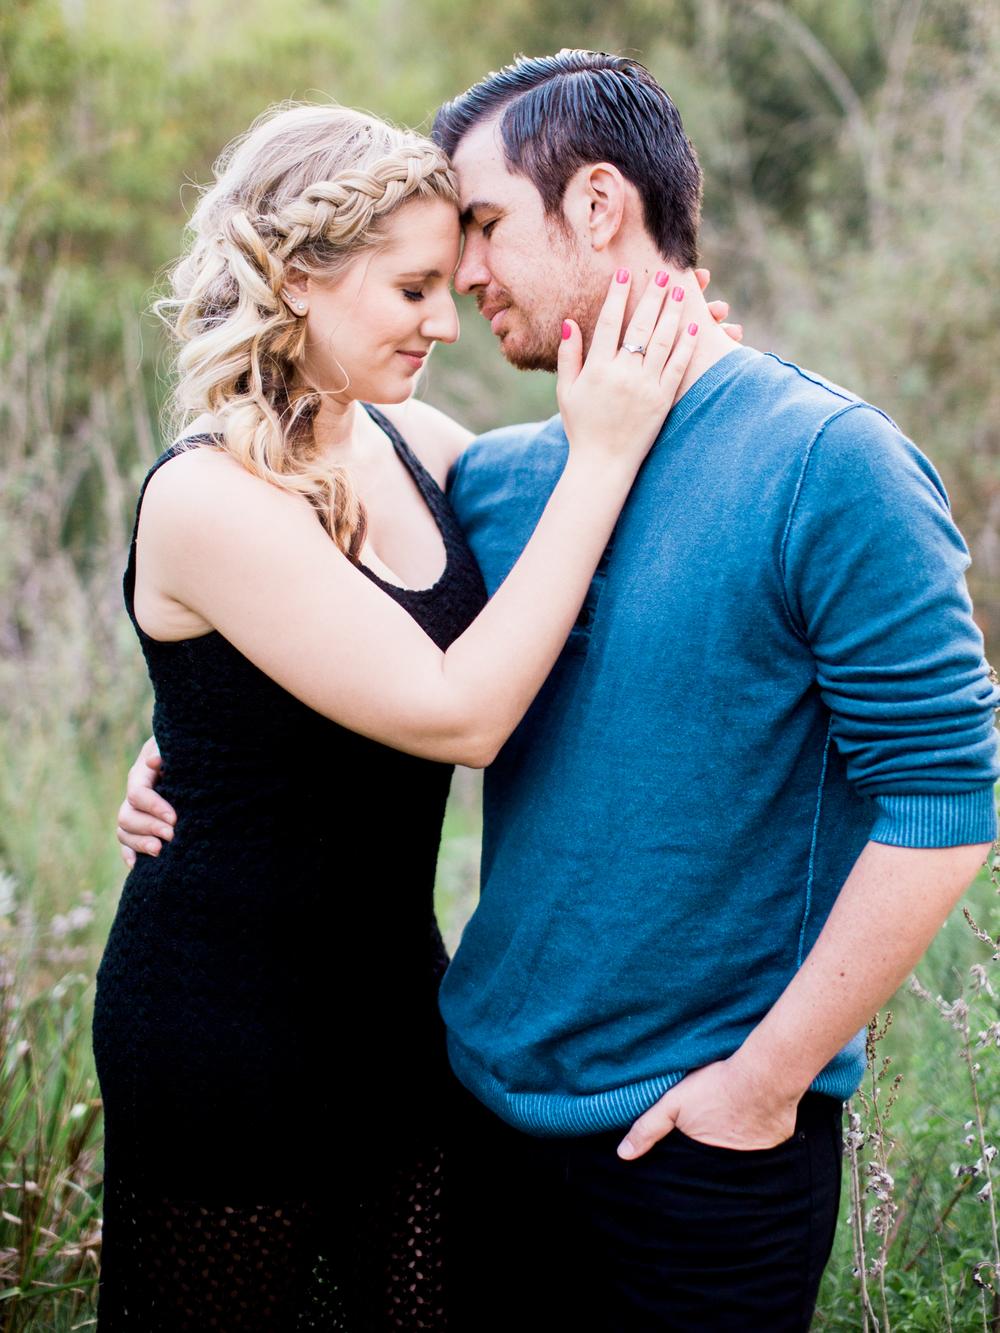 DennisRoyCoronel_CarstenChris_Engagement-88.jpg